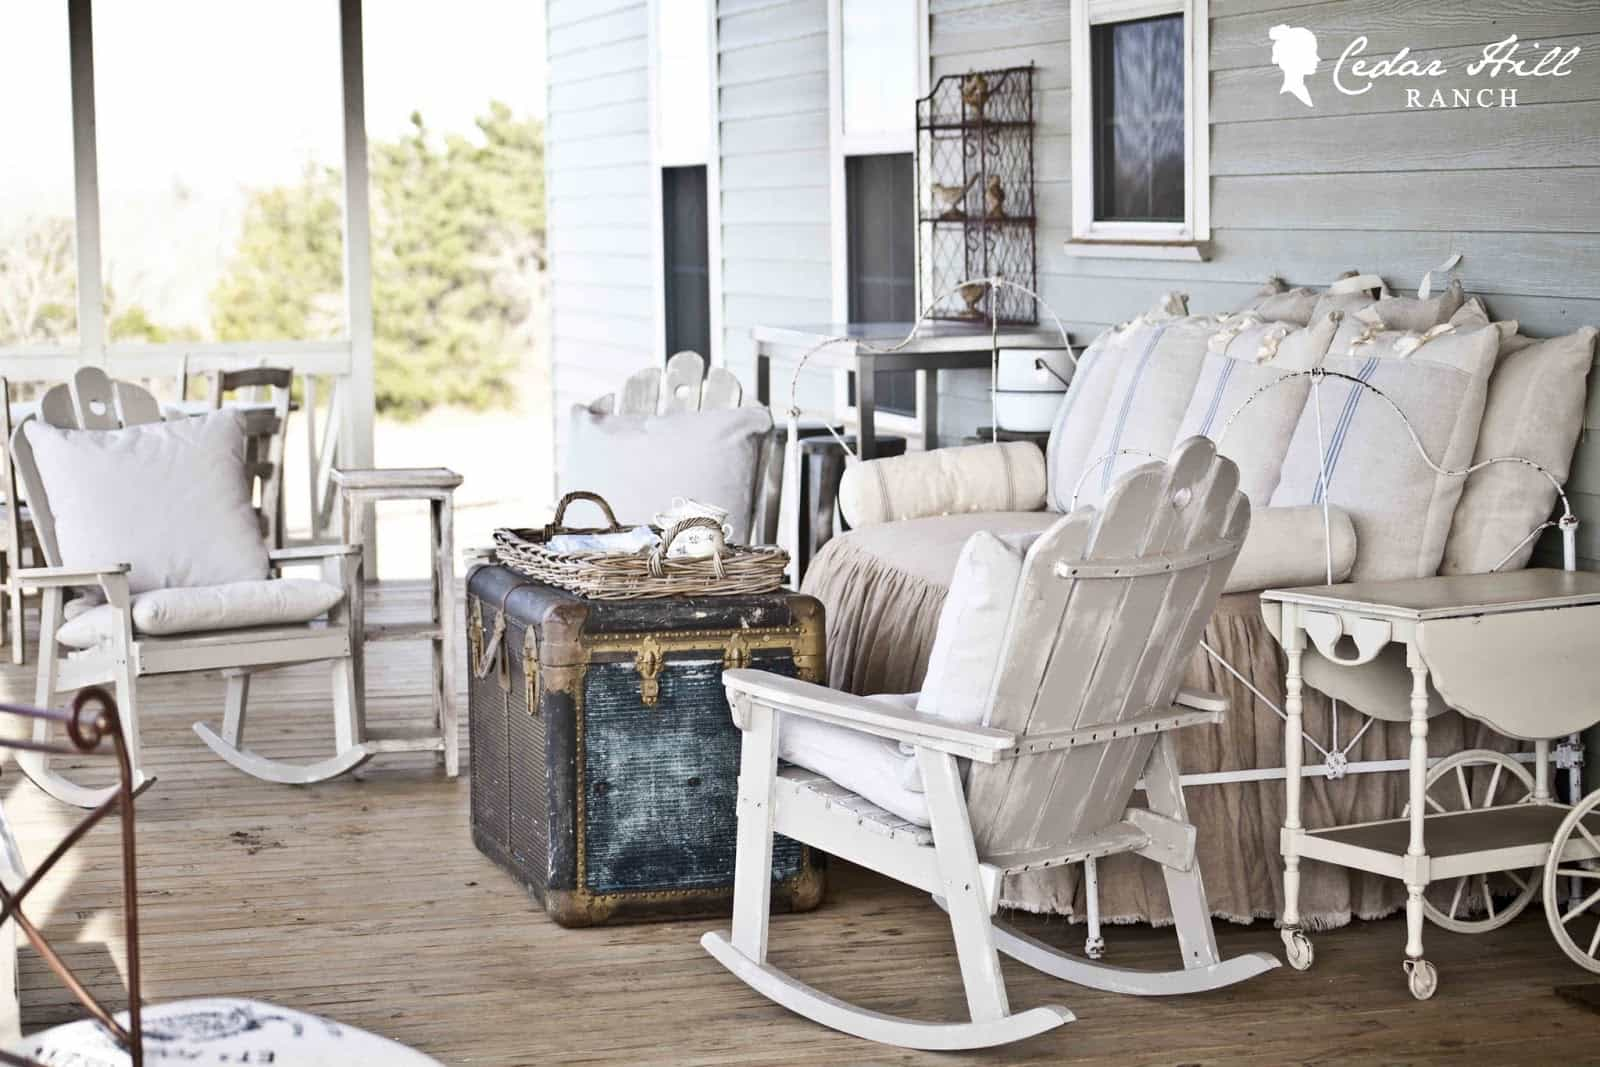 inspirational-back-porch-bed